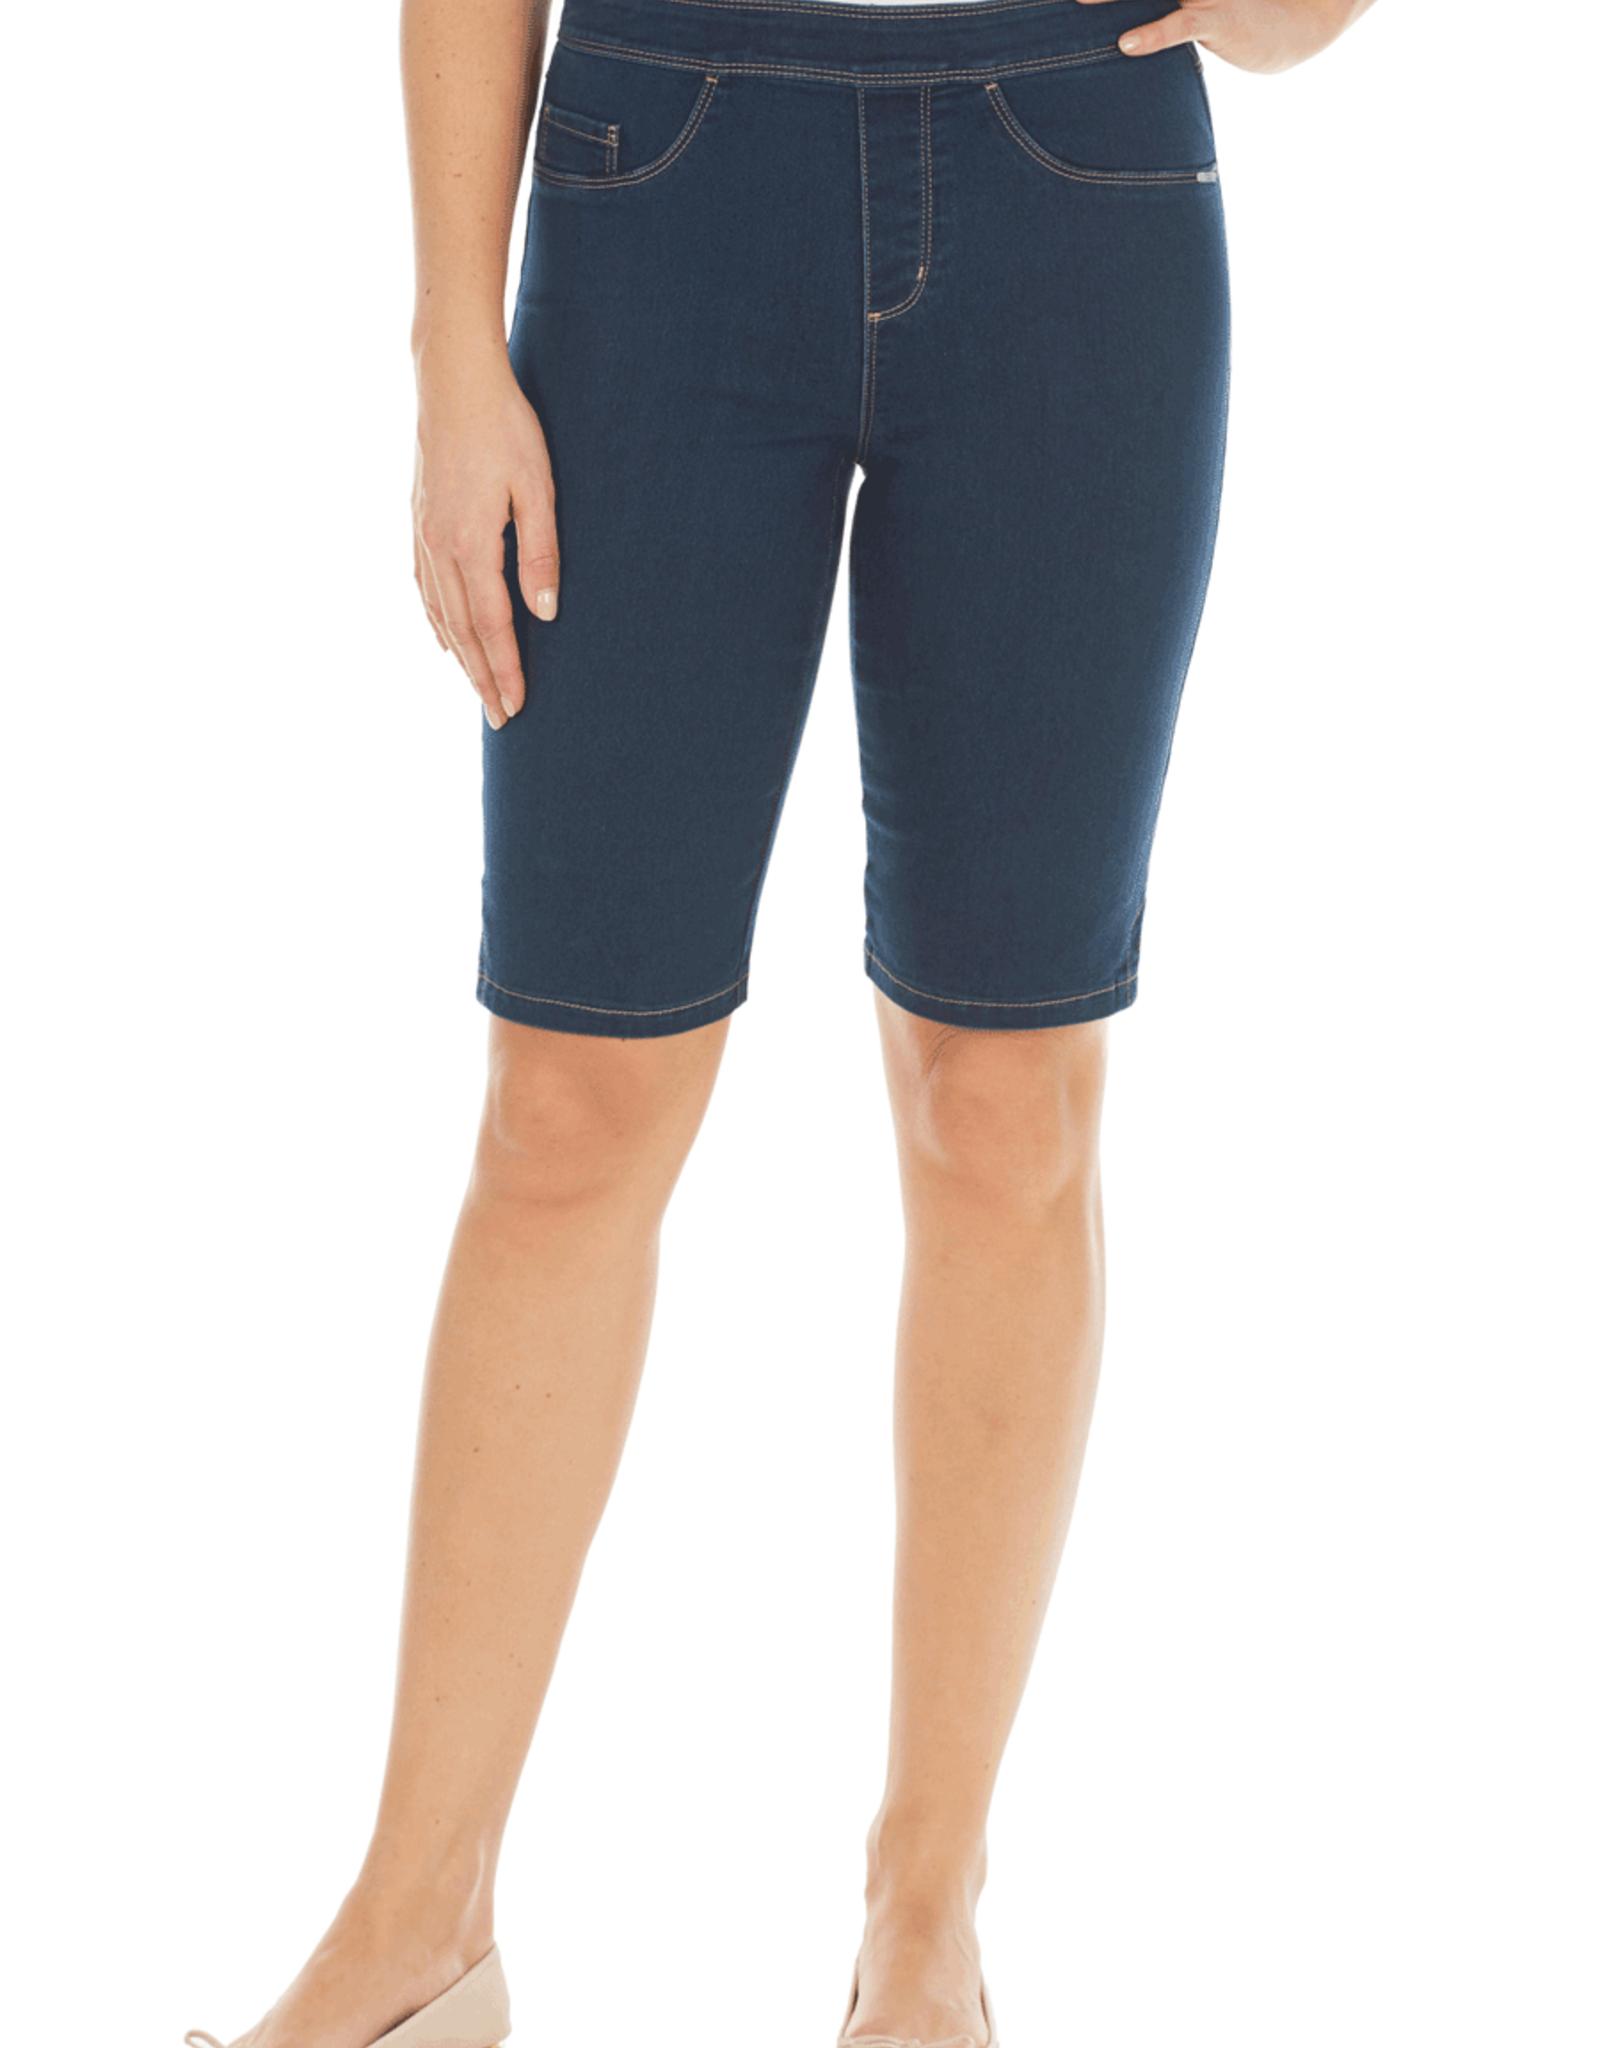 French Dressing Jeans FDJ pull-on Bermuda short 272406N